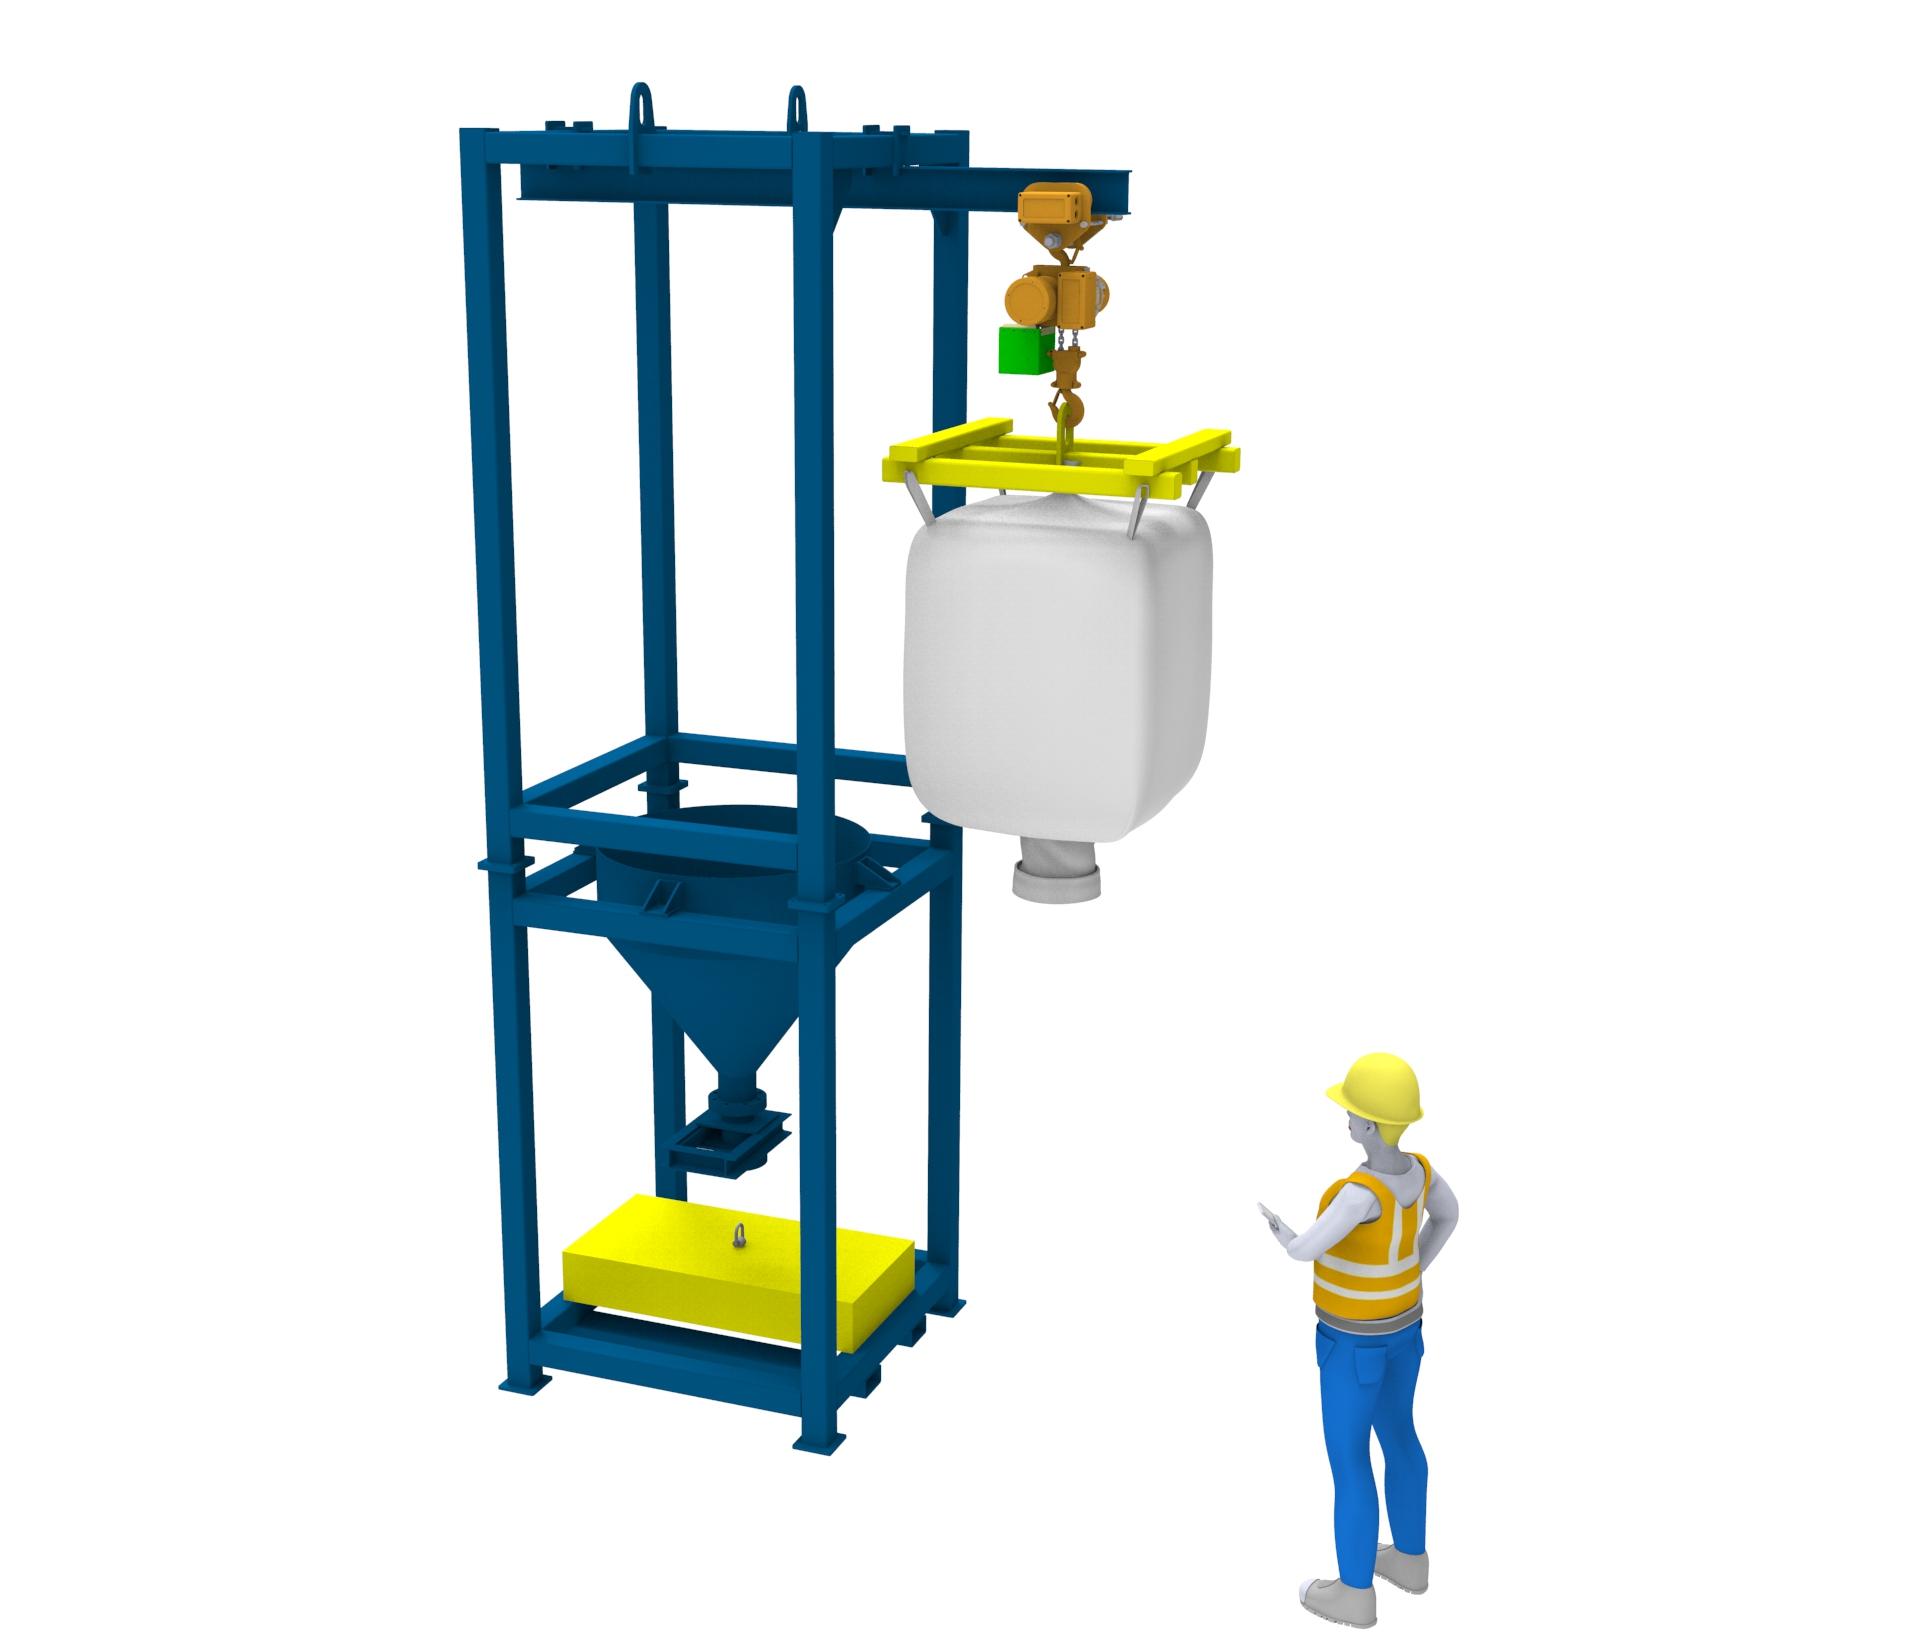 Volteador para bobinas con capacidad de 5 toneladas.